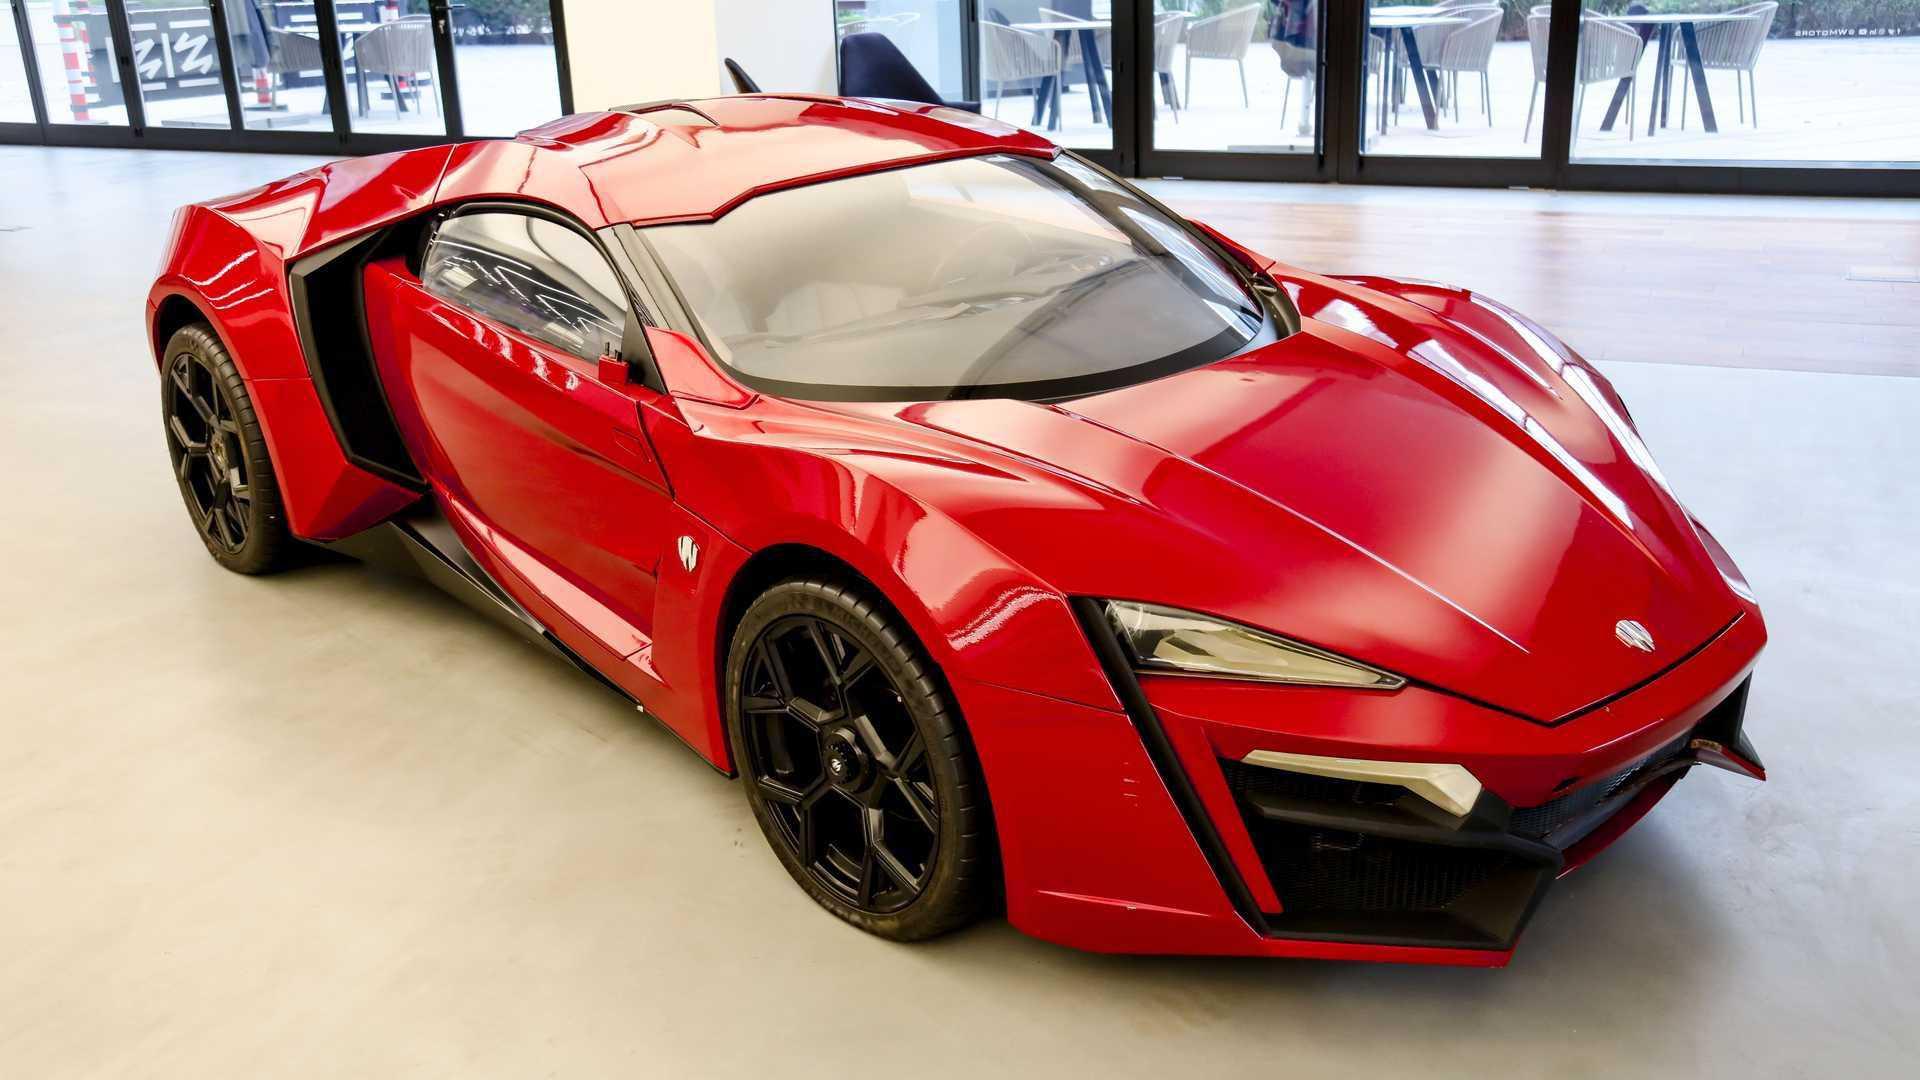 Lykan_HyperSport_stunt_car_sale-0000